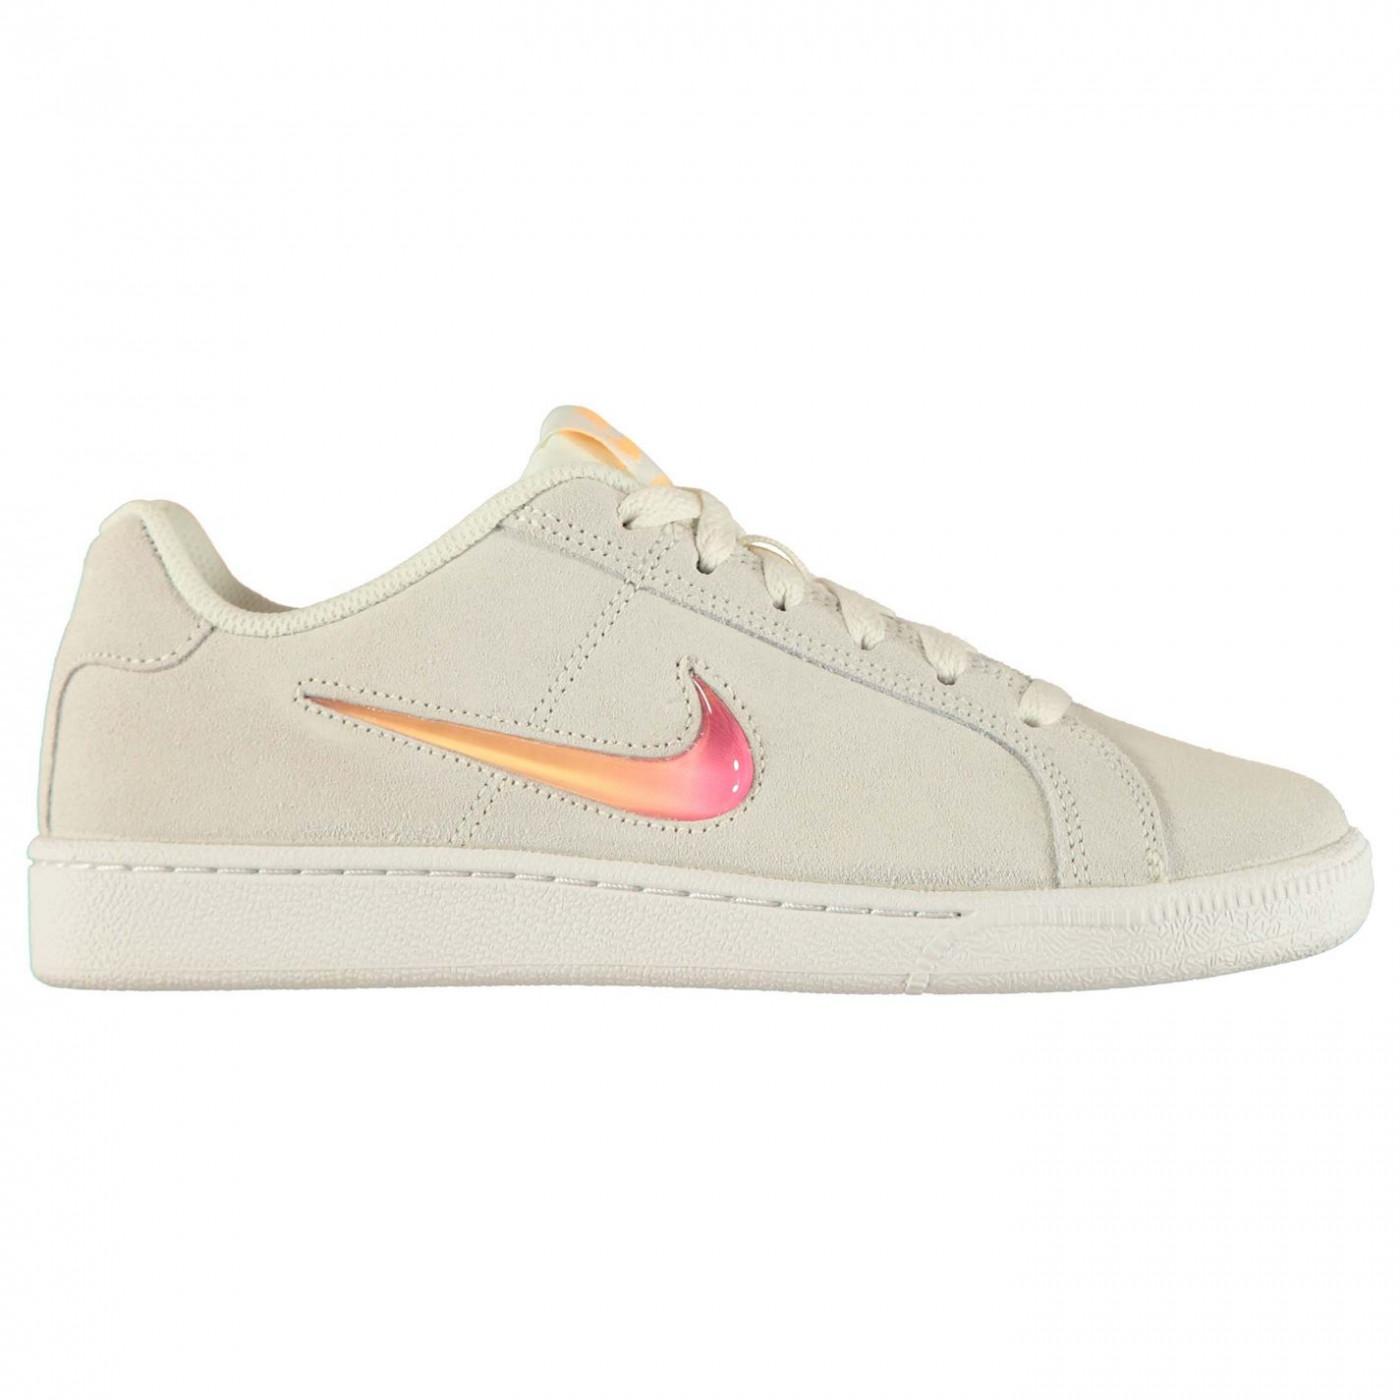 d21009389e1 Sneakersid - FACTCOOL